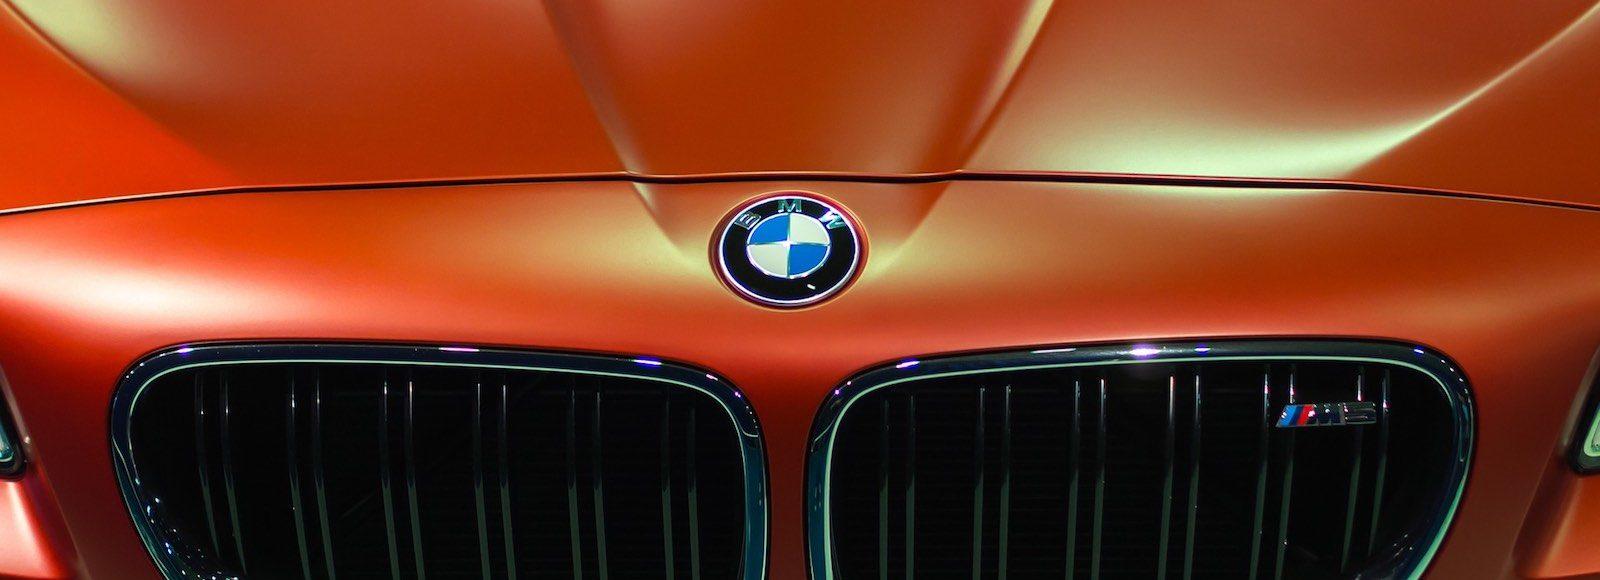 BMW M5 Revhead